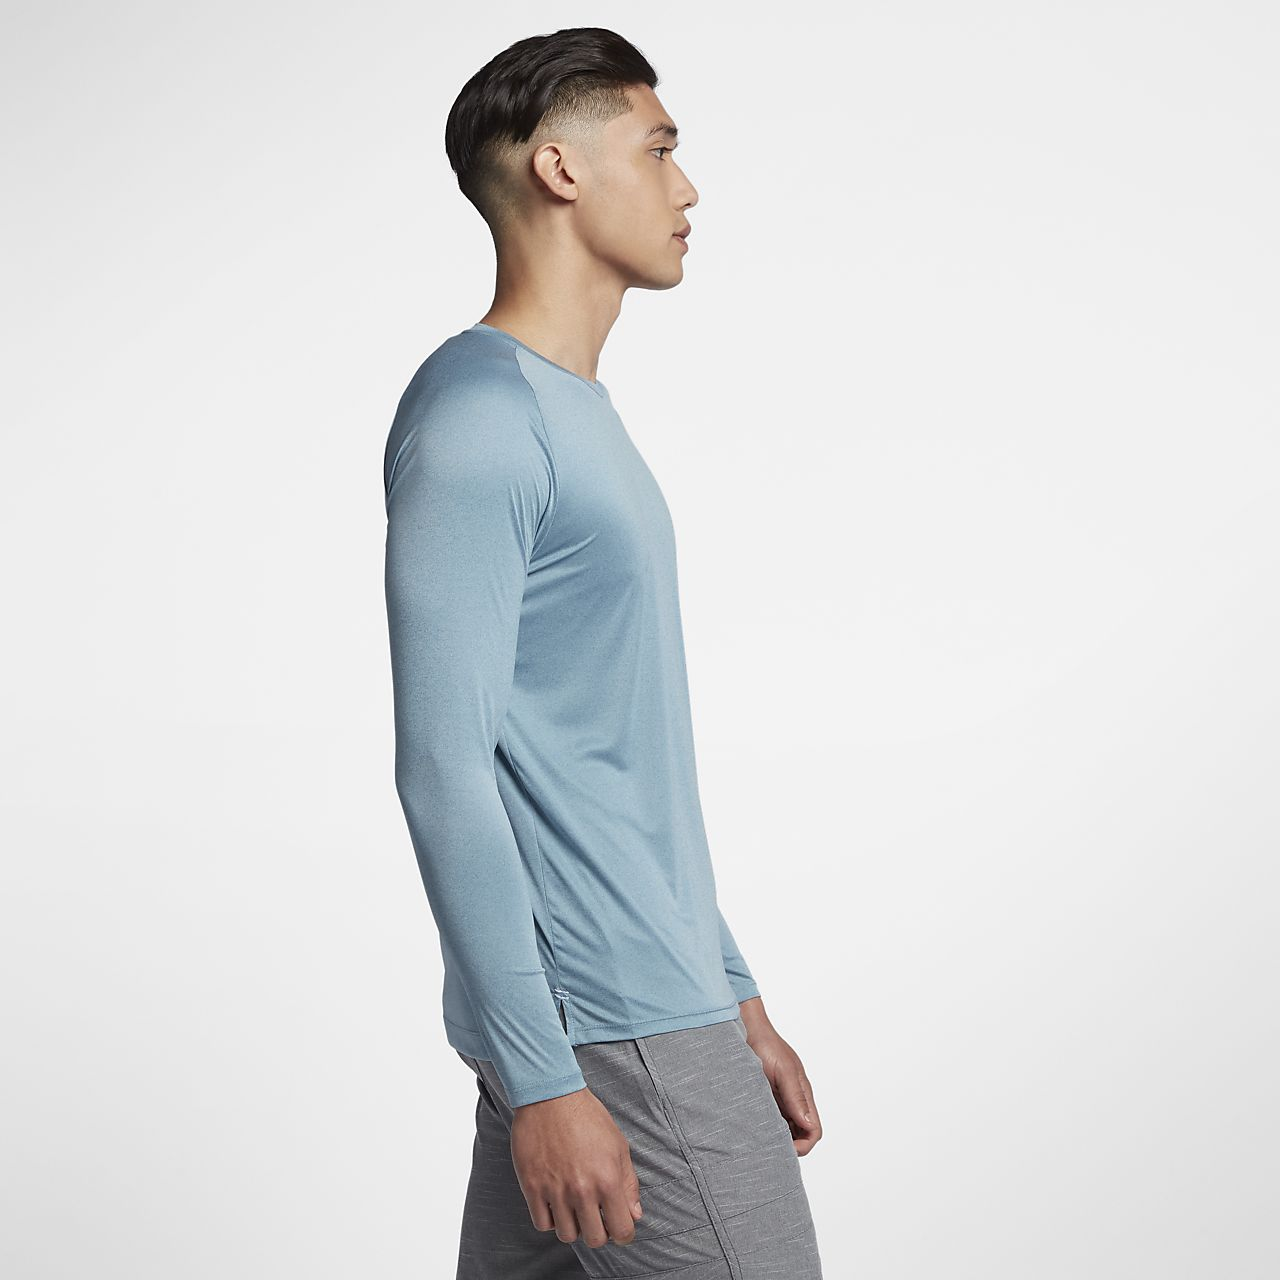 36b25077 Hurley Icon Quick Dry Men's Long Sleeve Surf Shirt. Nike.com